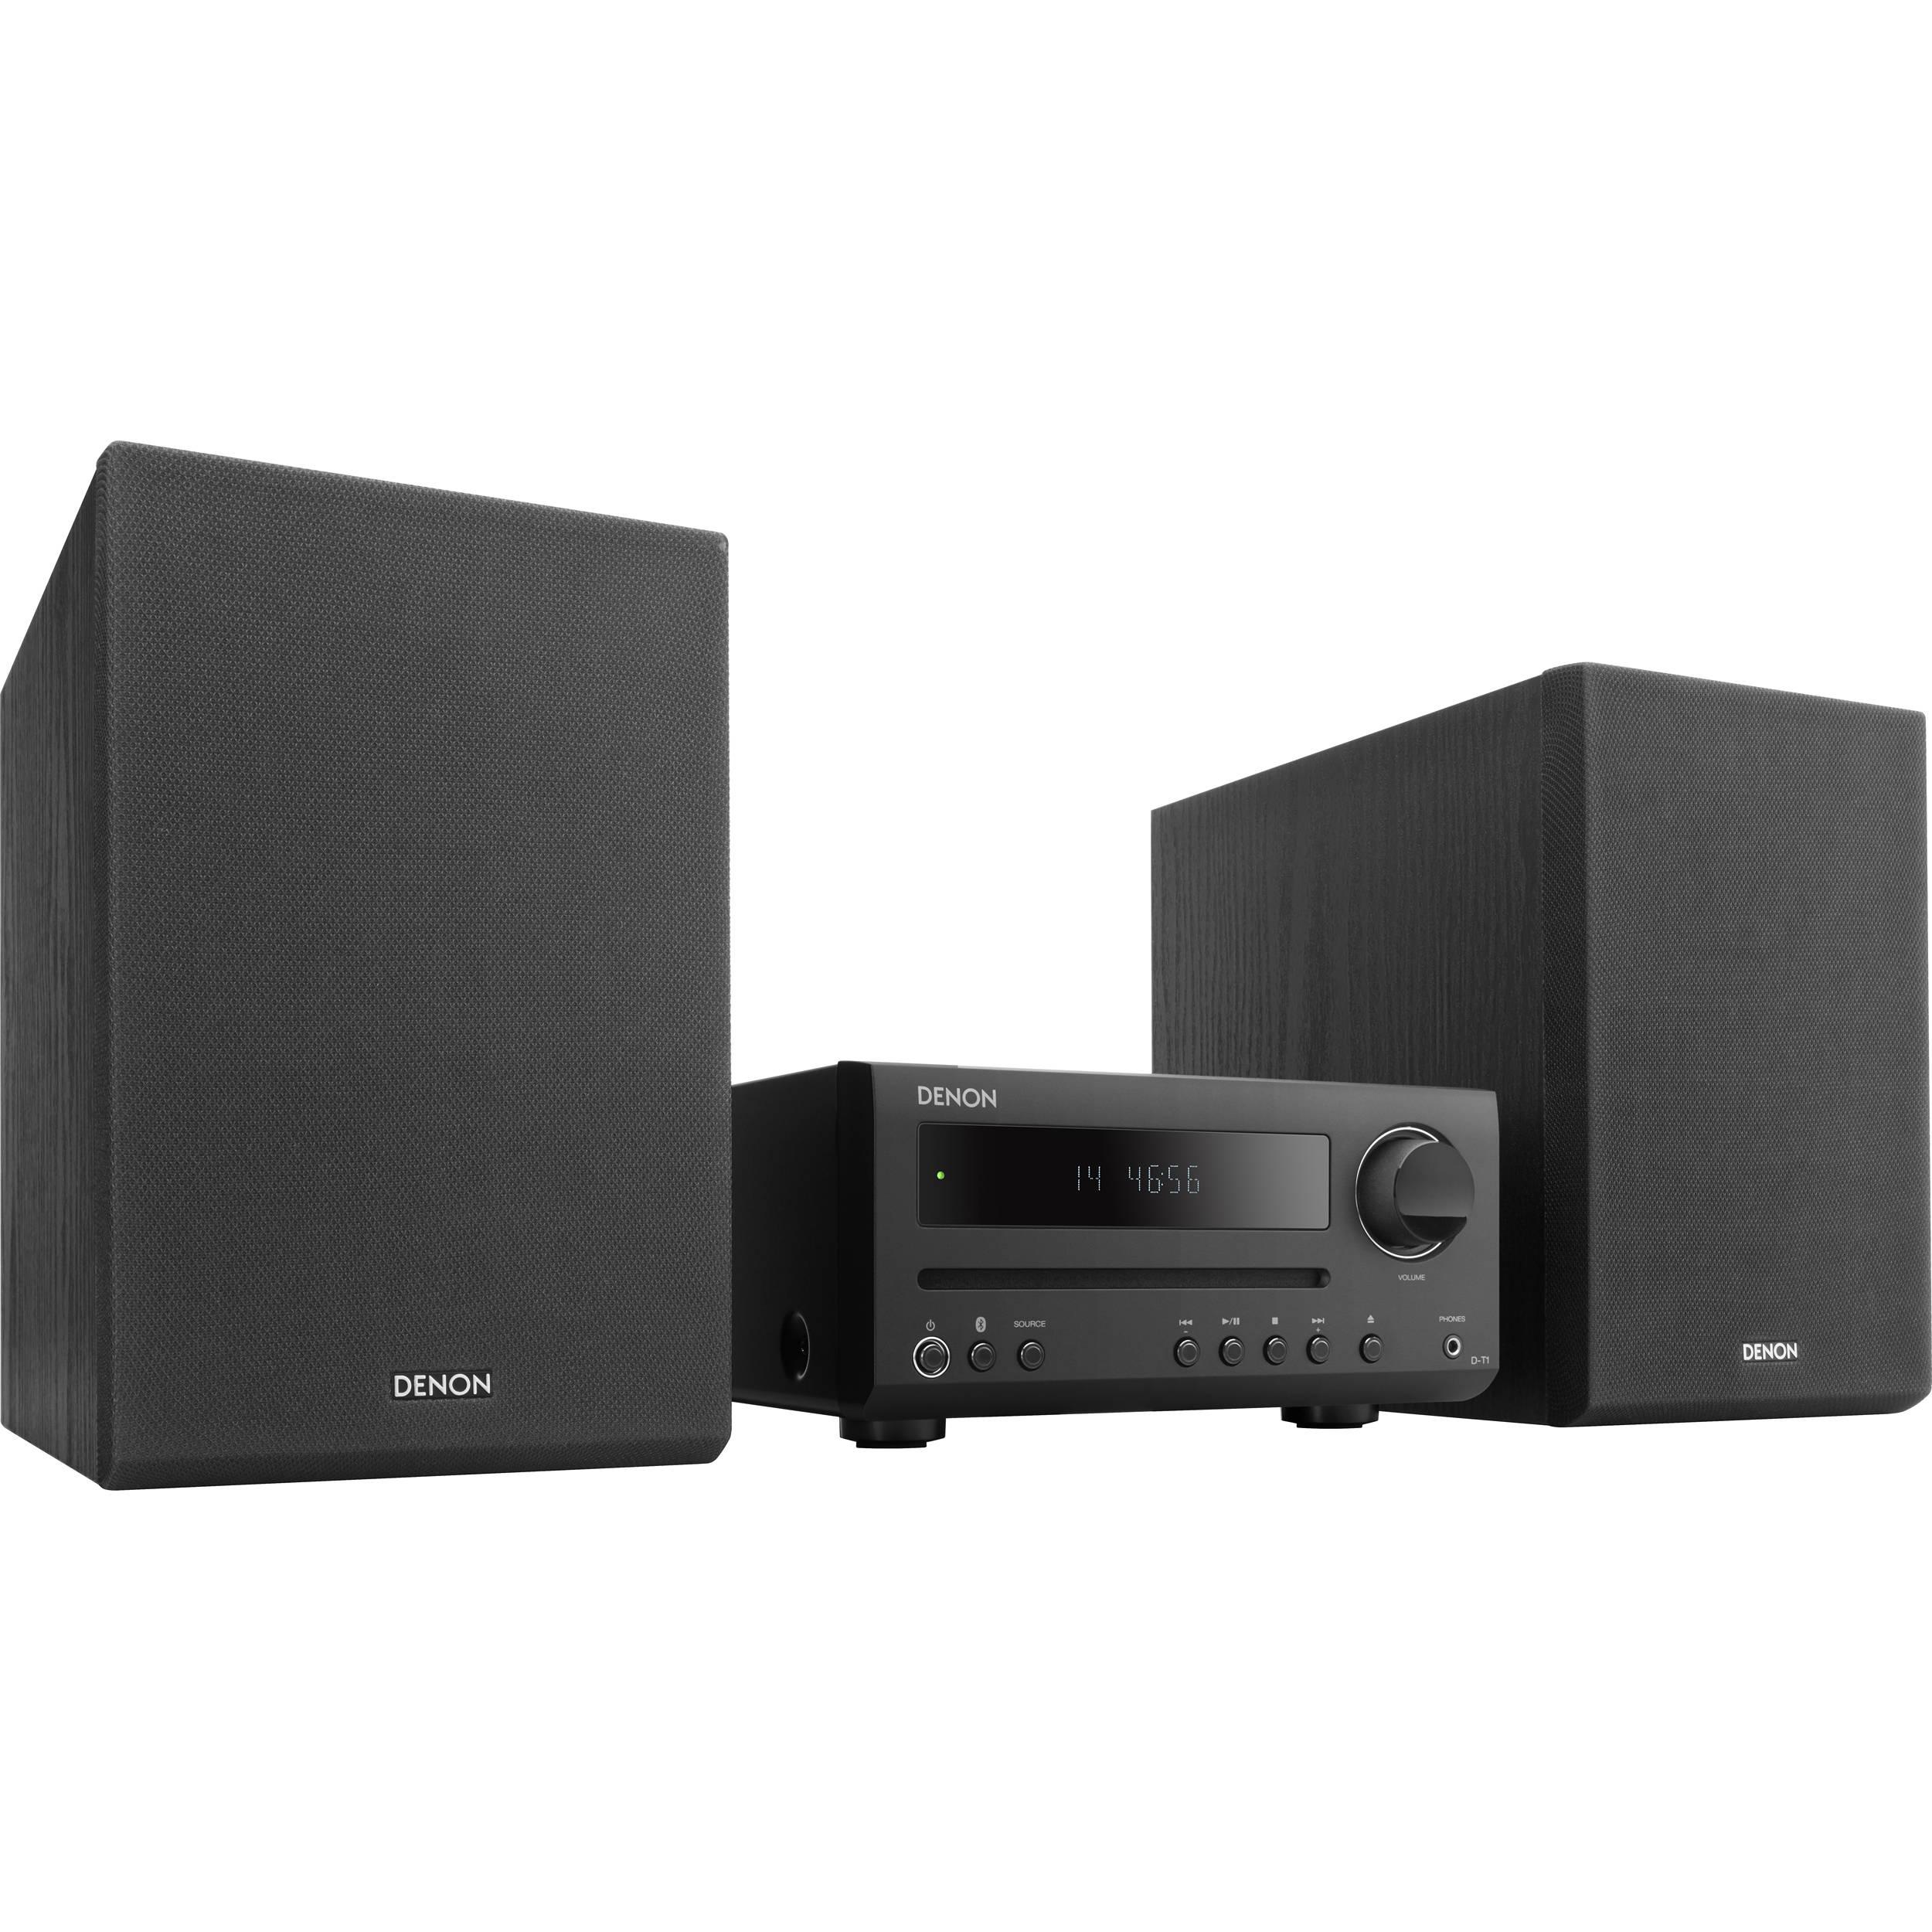 Denon D-T1 30W Bluetooth Wireless Music System DT-1 B&H Photo